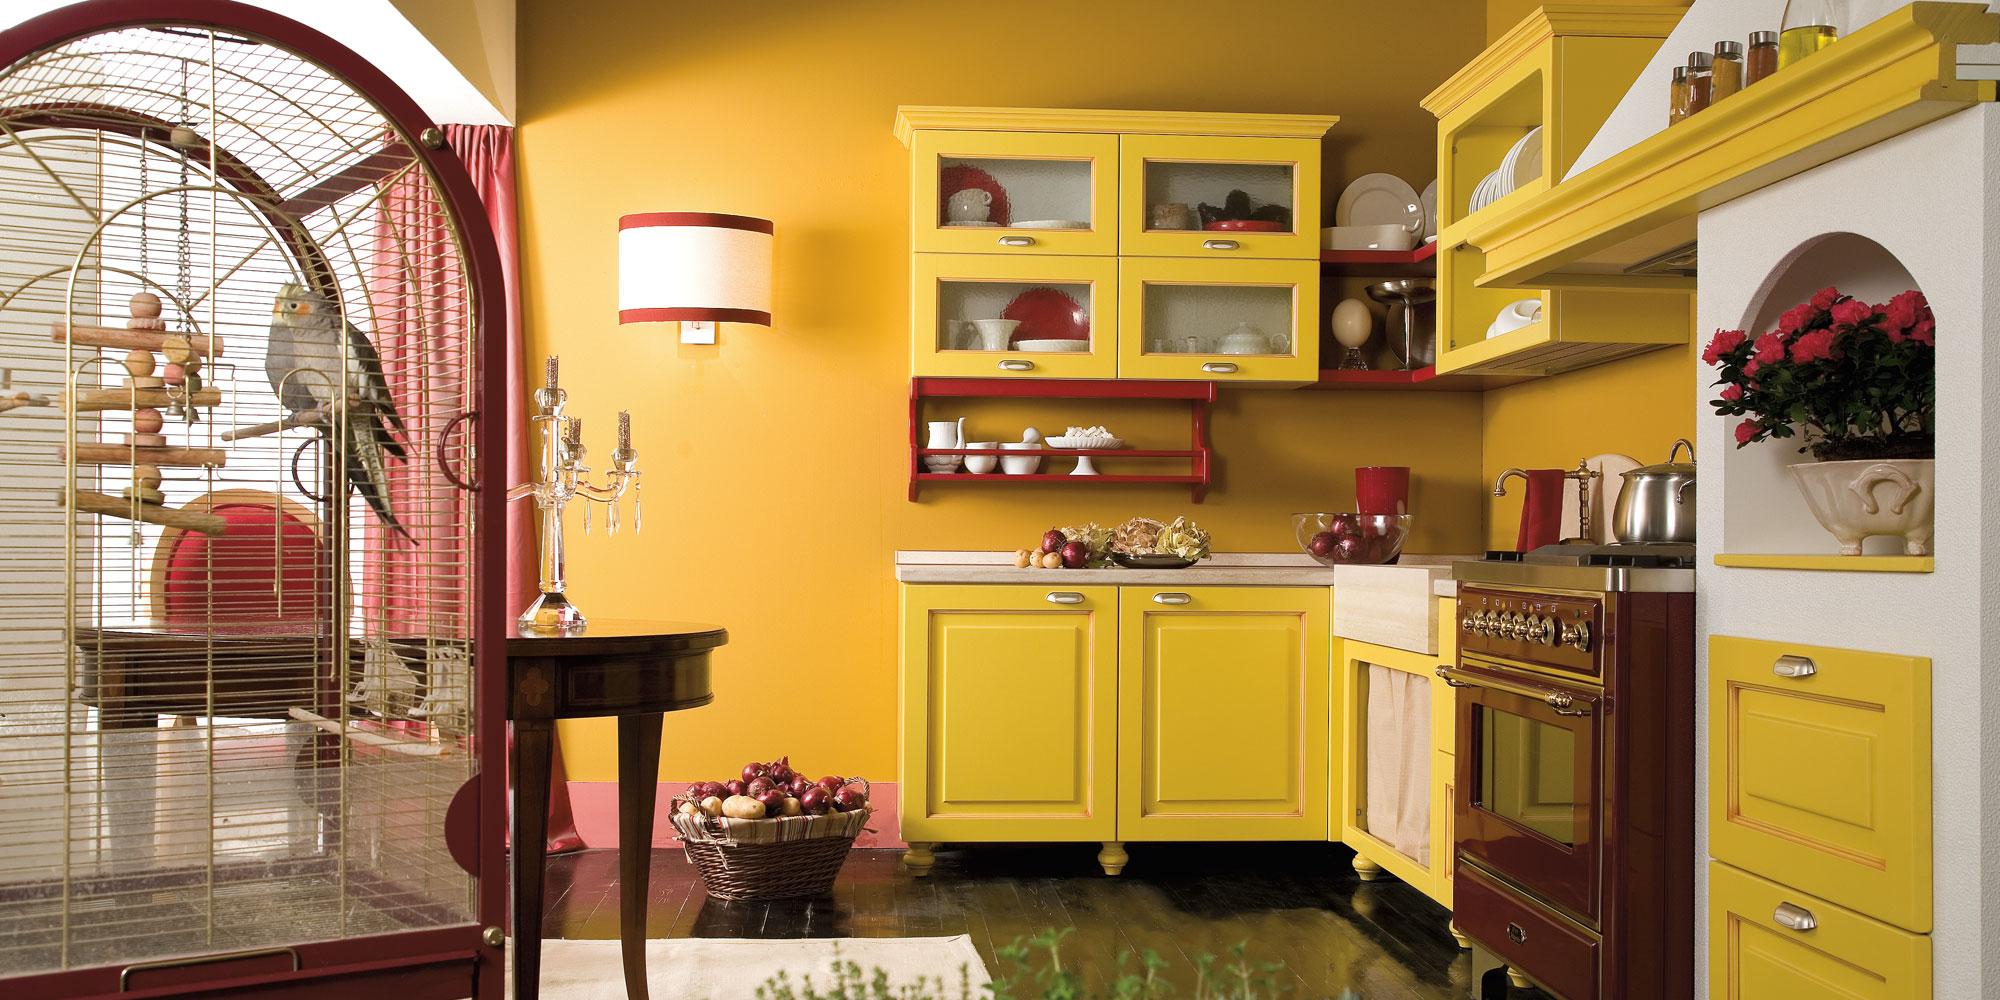 Prodotti - Bindi Cucine | Olivieri & Bosco